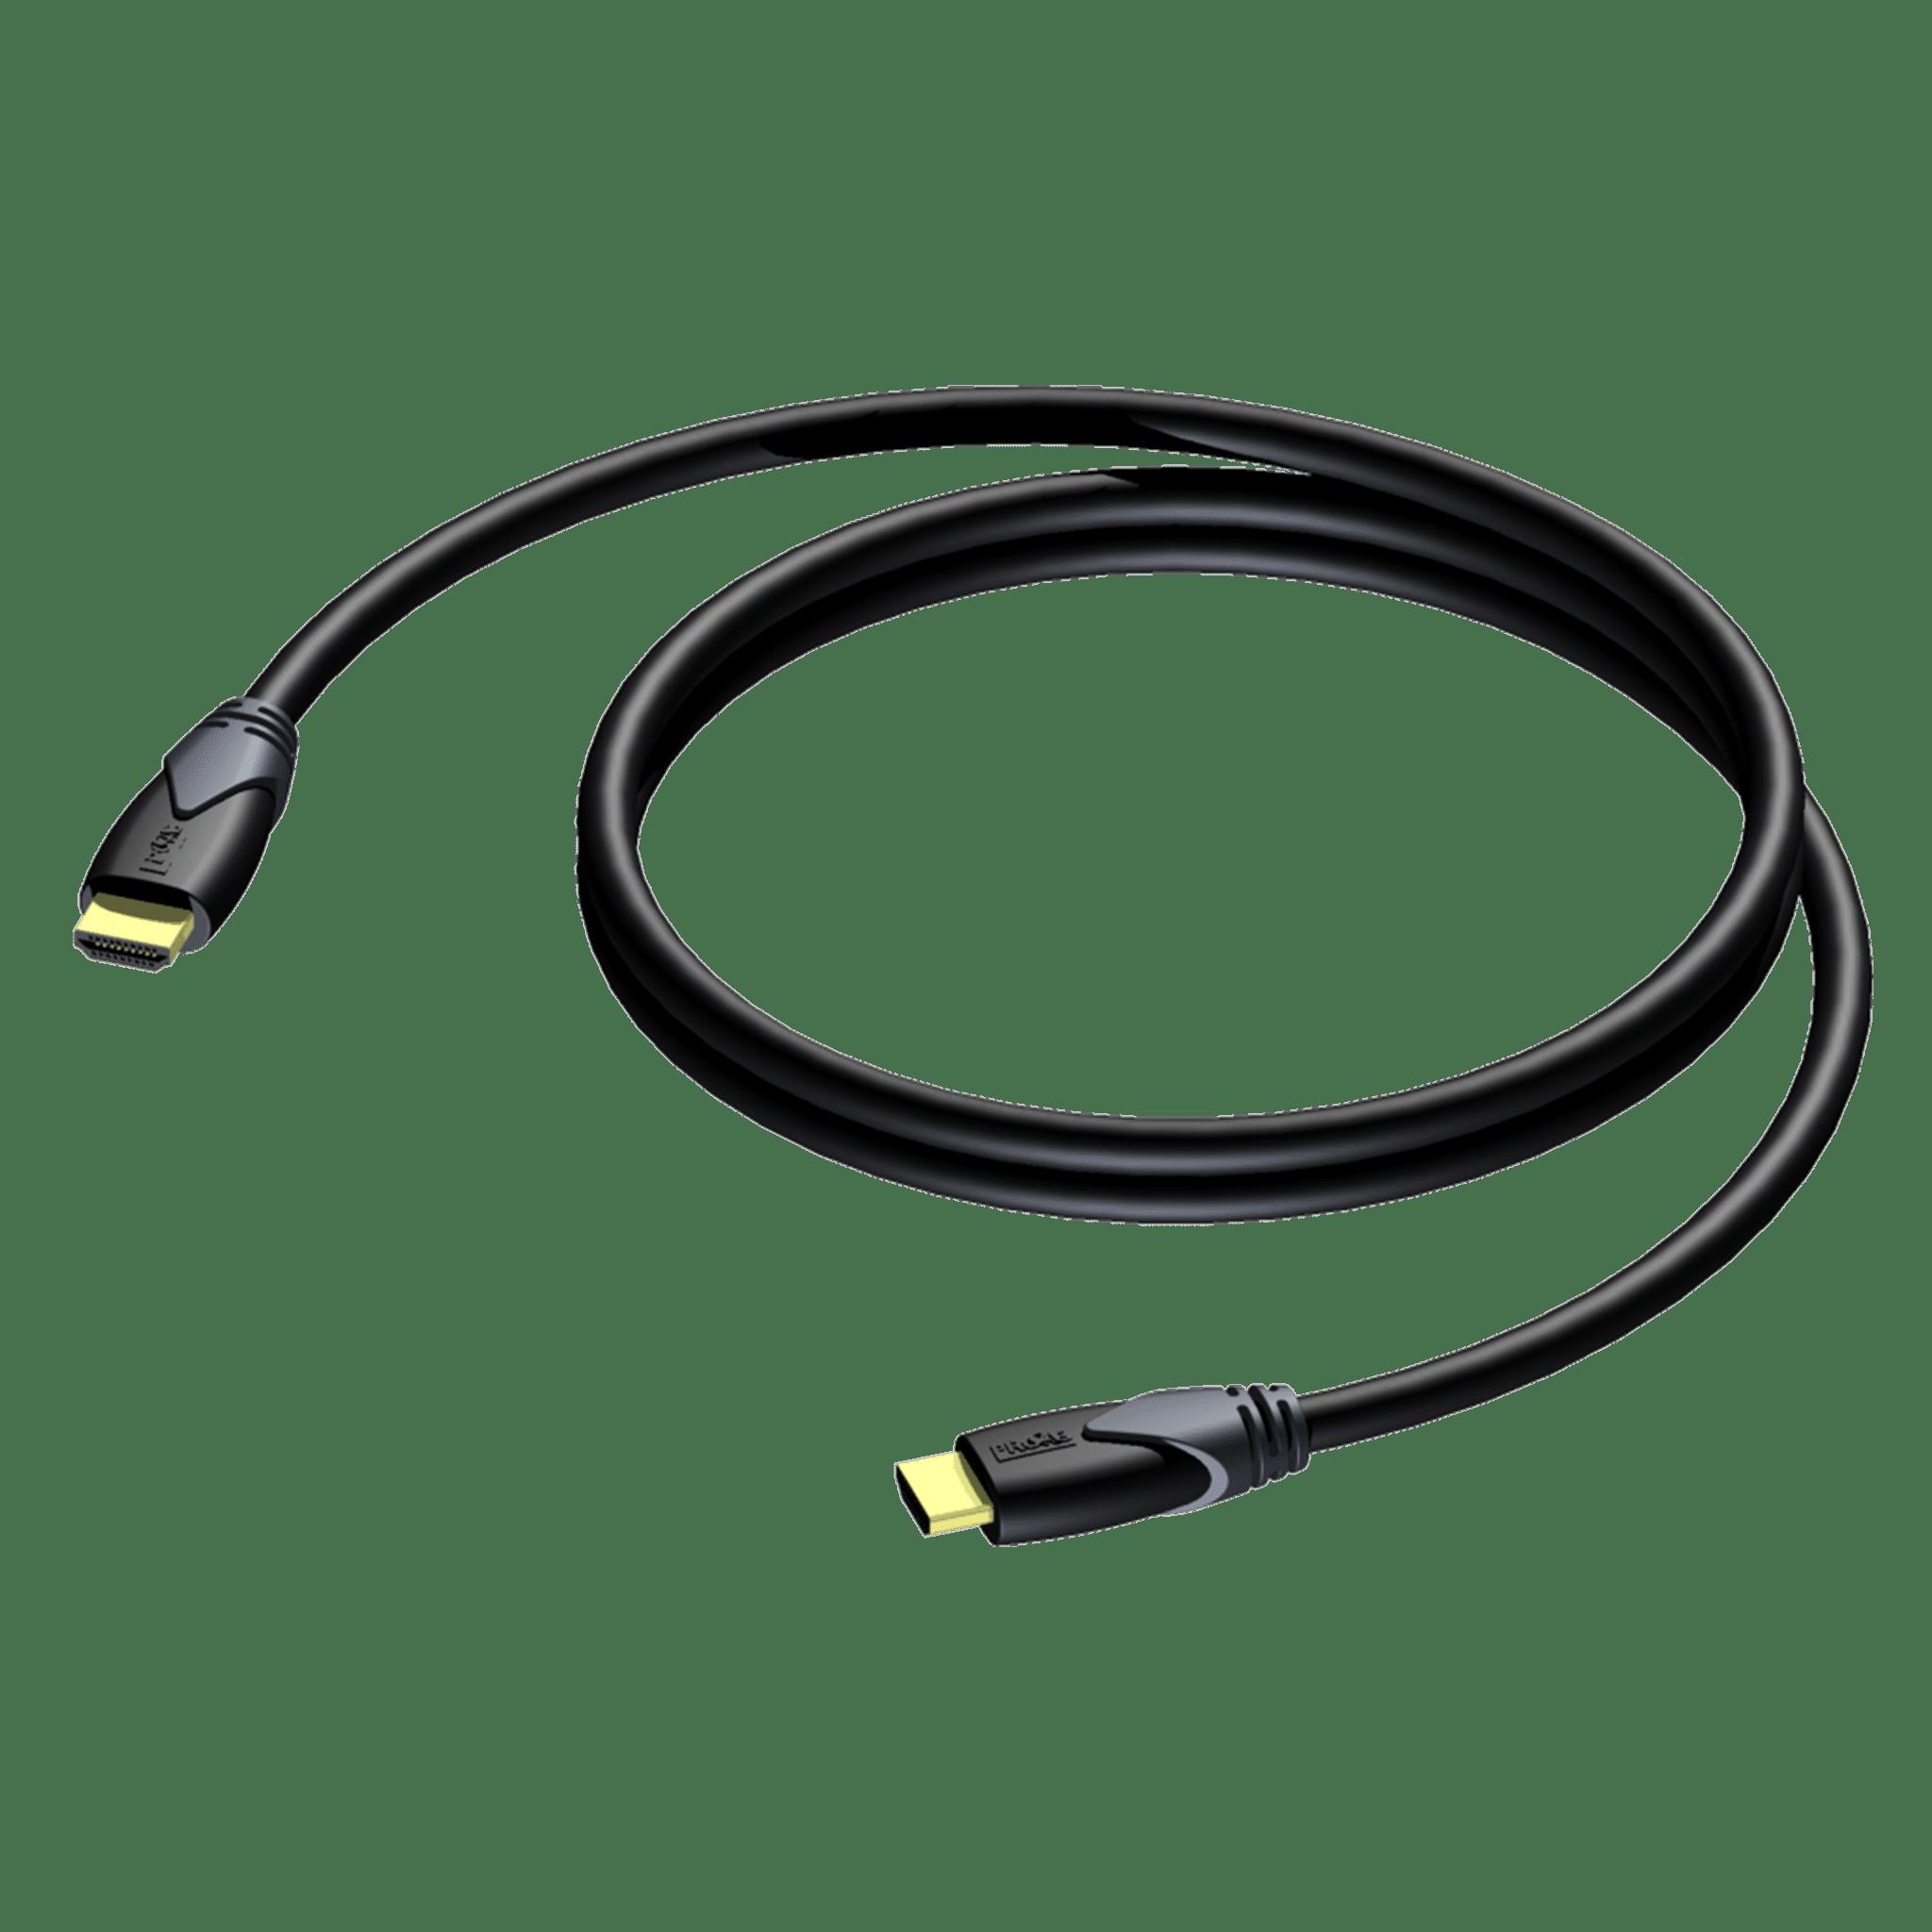 CLV200 - HDMI A male - HDMI A male - LSHF